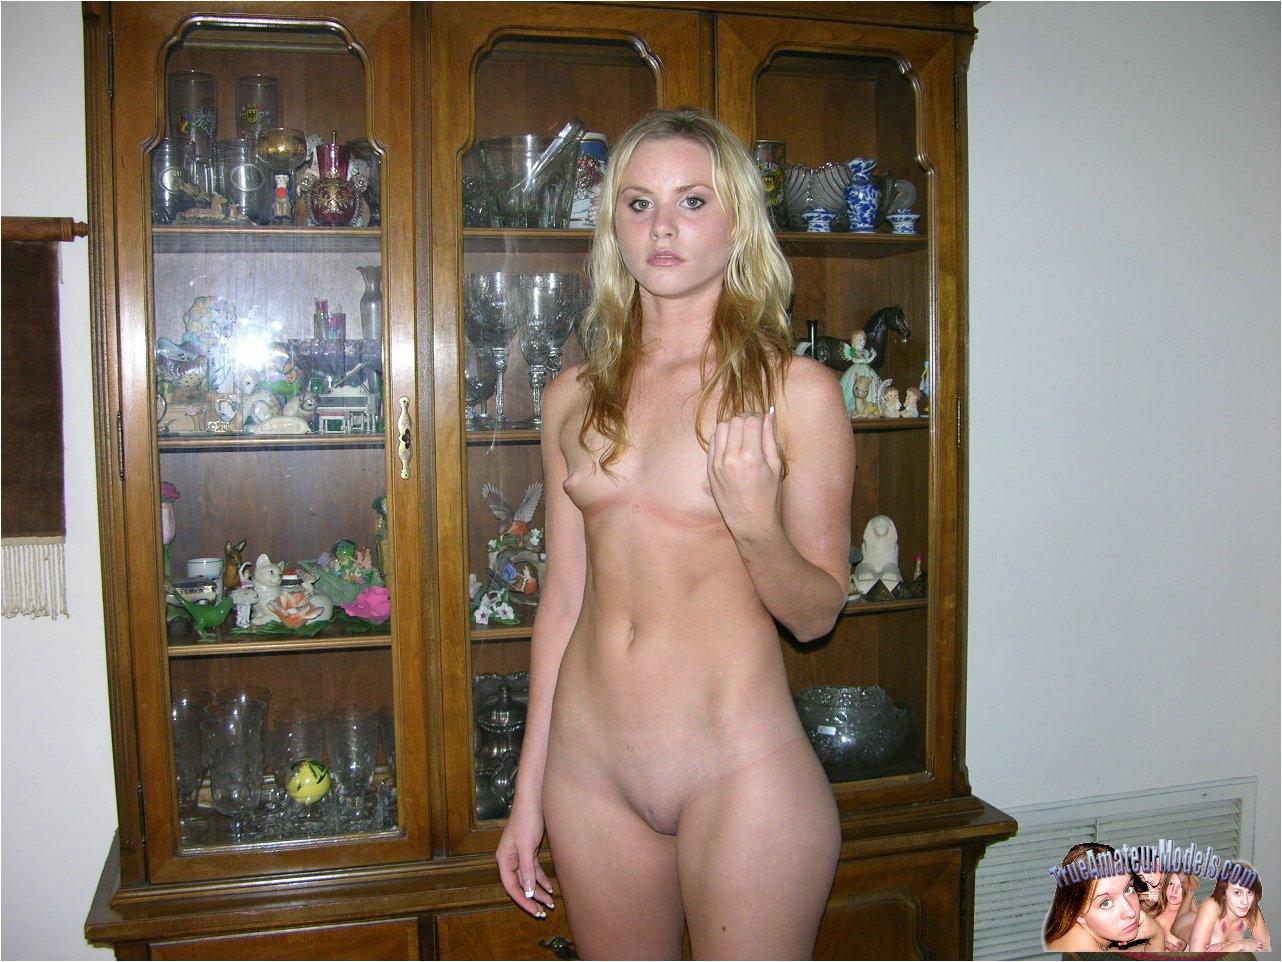 nikki-benz-seks-foto